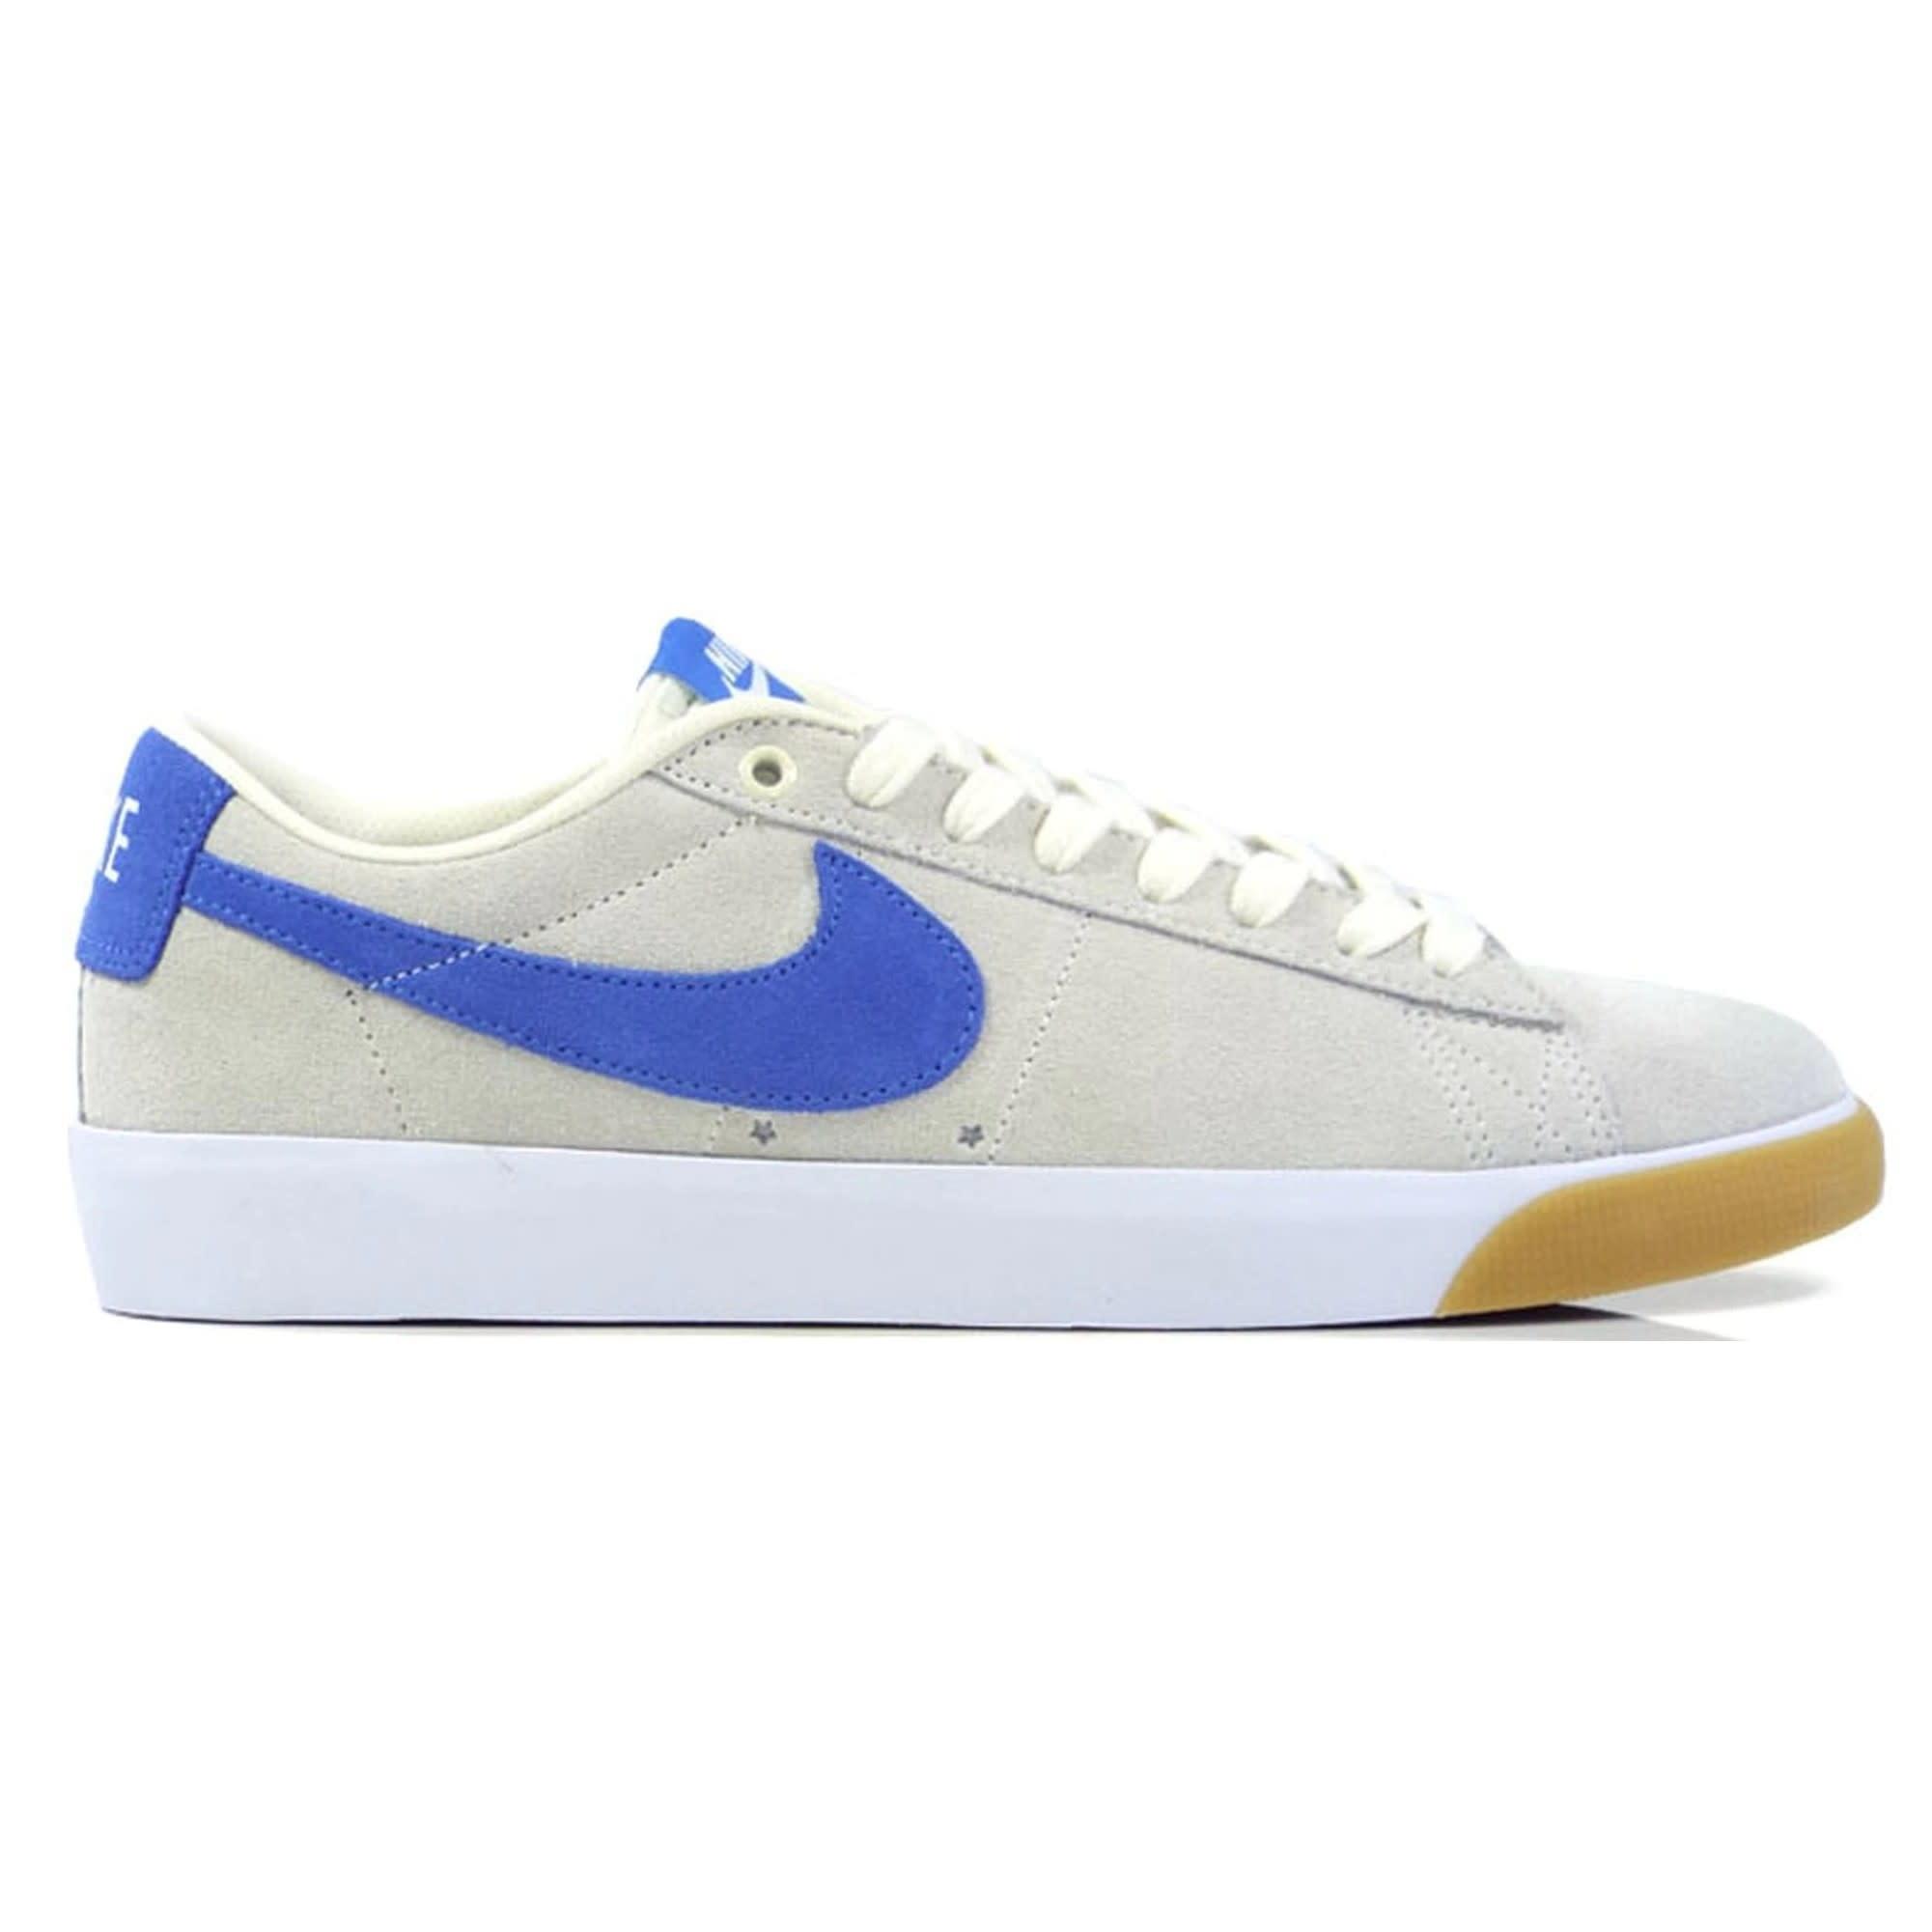 Nike USA, Inc. Nike SB Zoom Blazer Low GT Pale Ivory/Pacific Blue 13